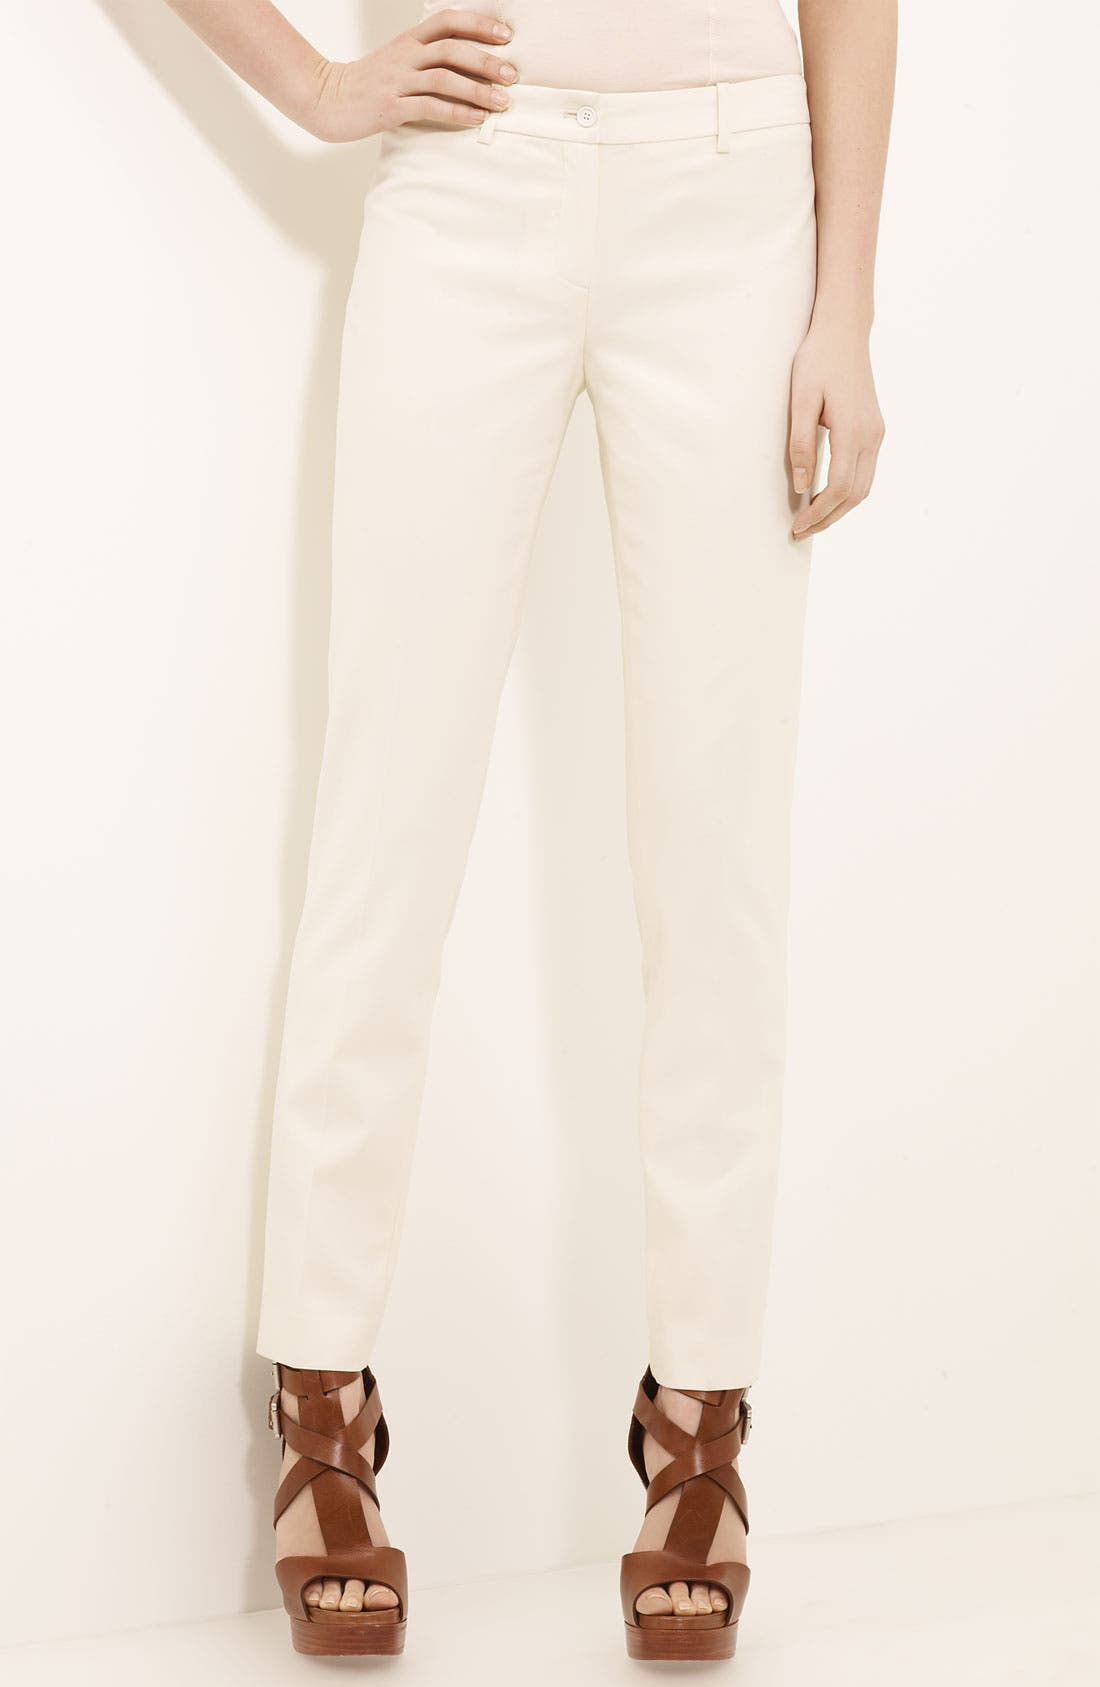 Main Image - Michael Kors 'Samantha' Skinny Wool Serge Pants